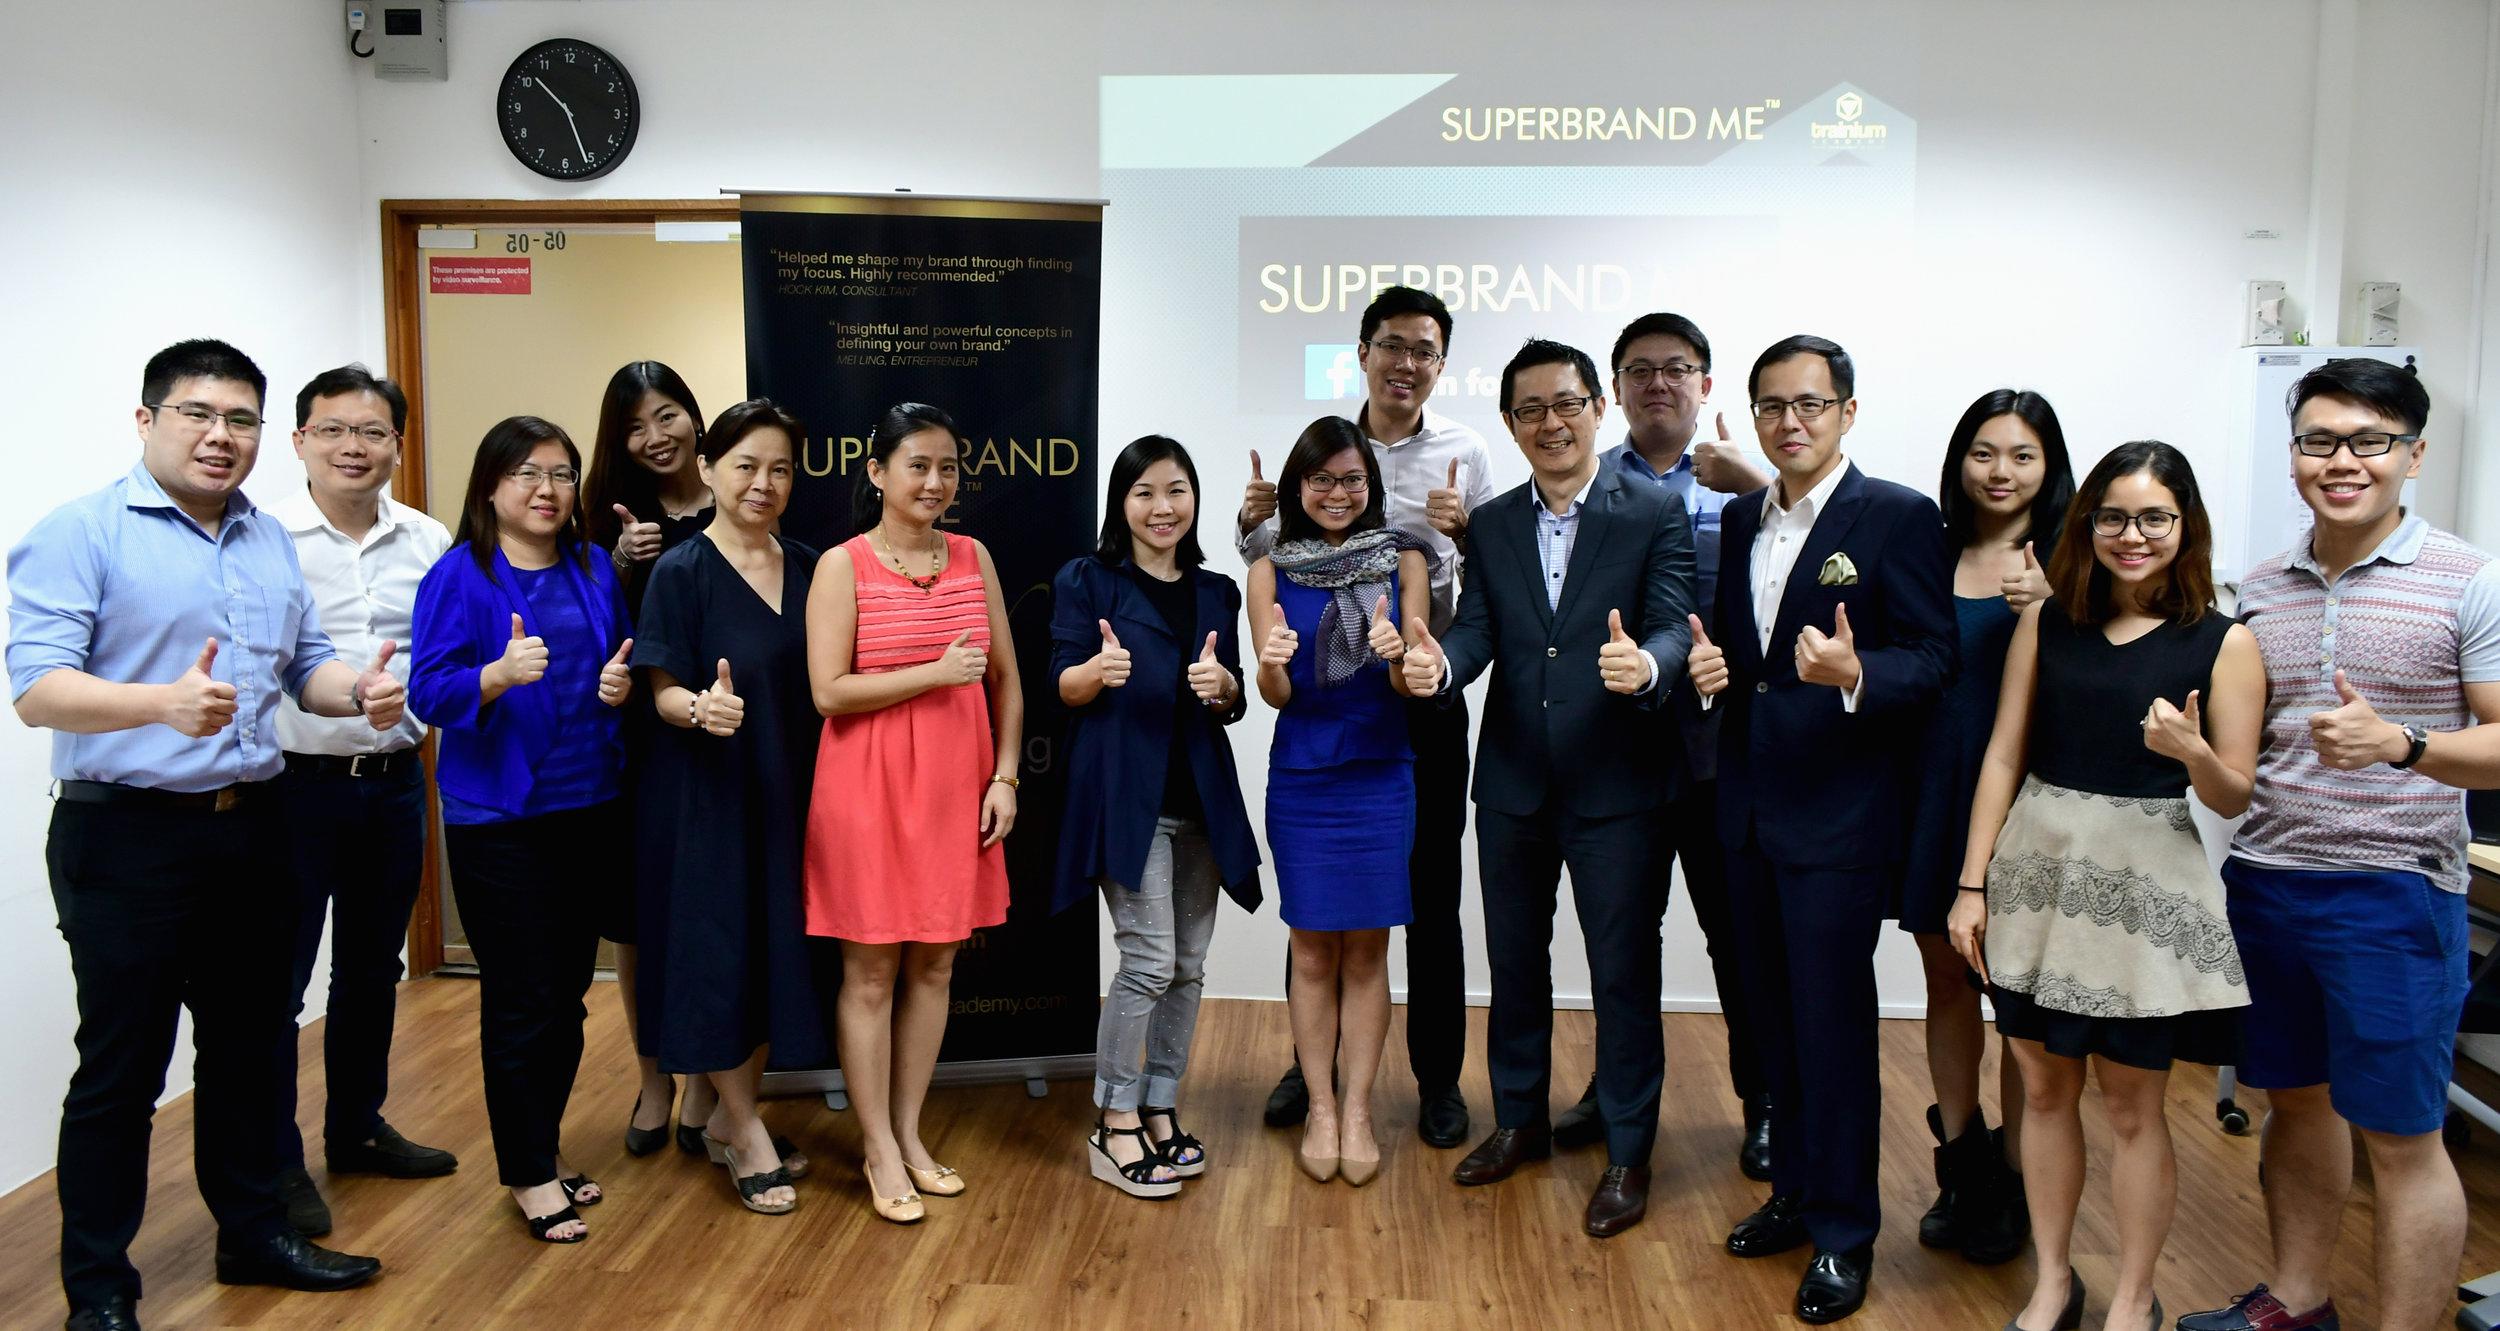 SuperBrand Me - 18 Sep 2017